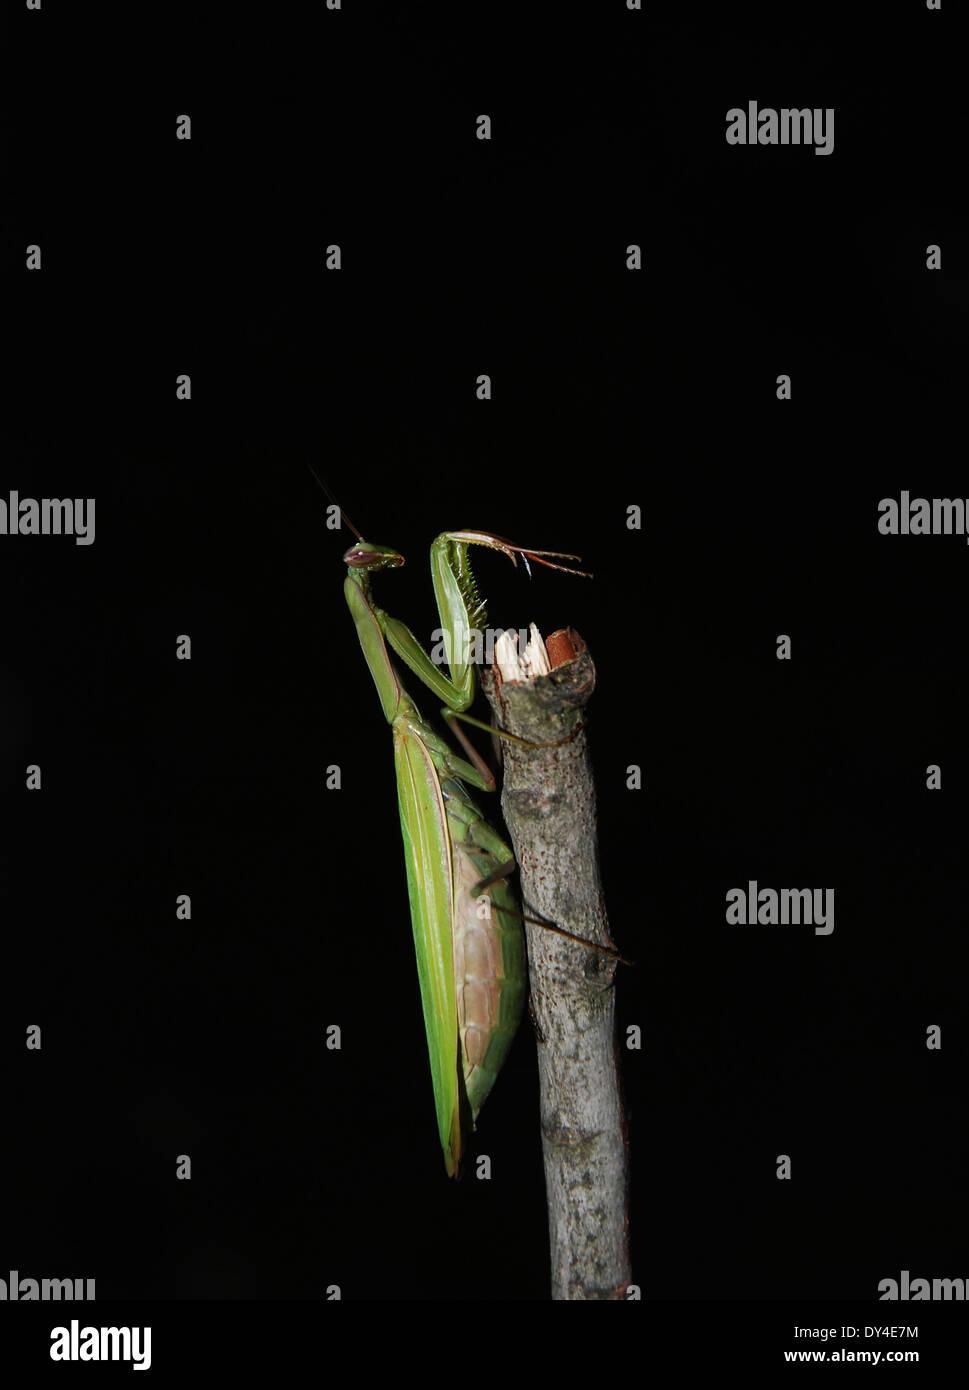 Preying Mantis poised on stick against black background - Stock Image